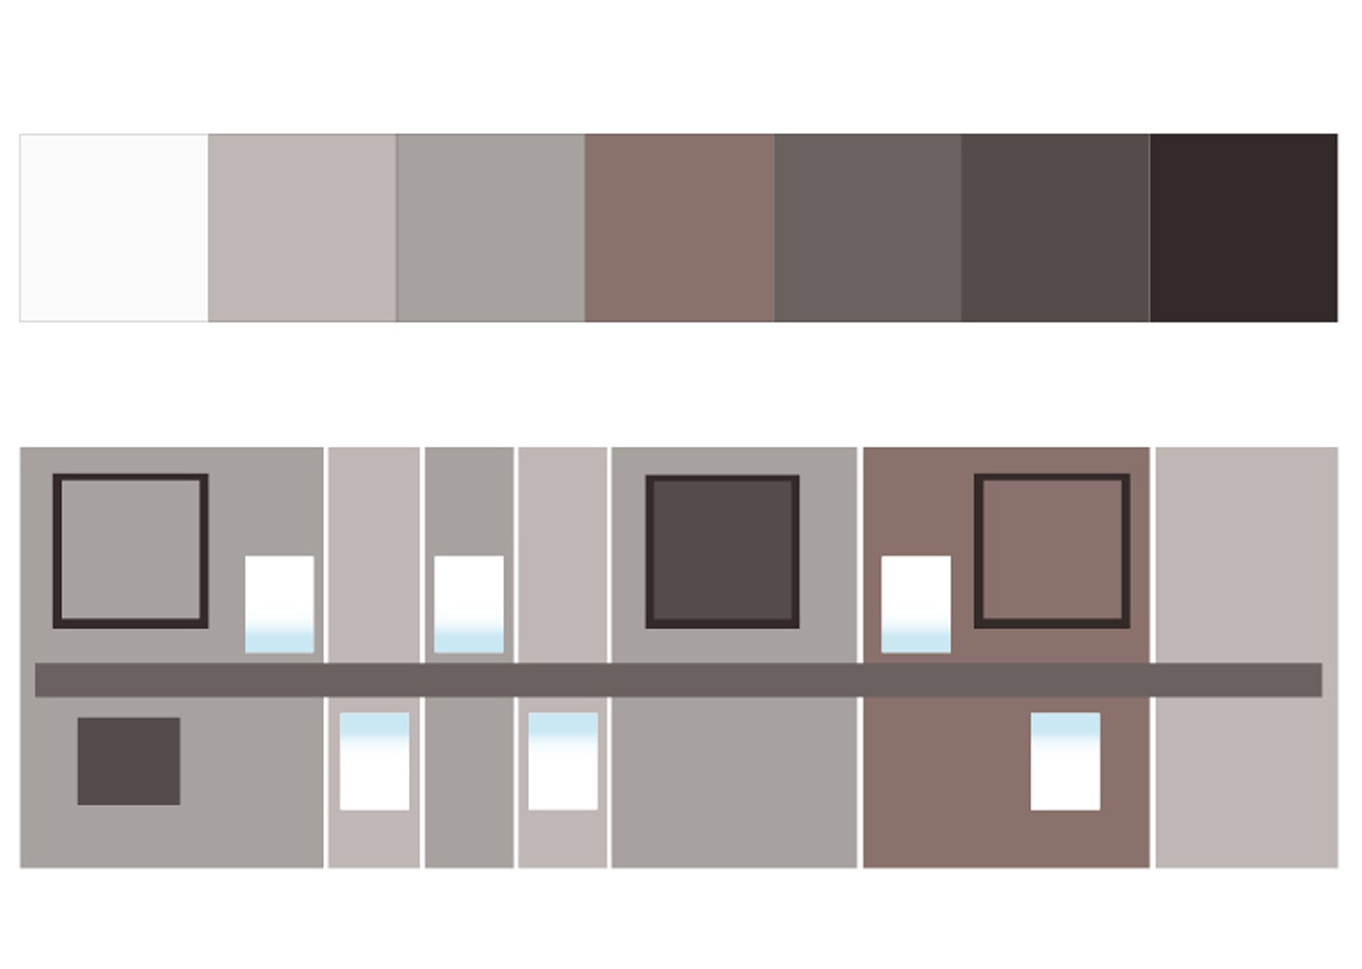 filgut com_Mido eyewear show_colour concept